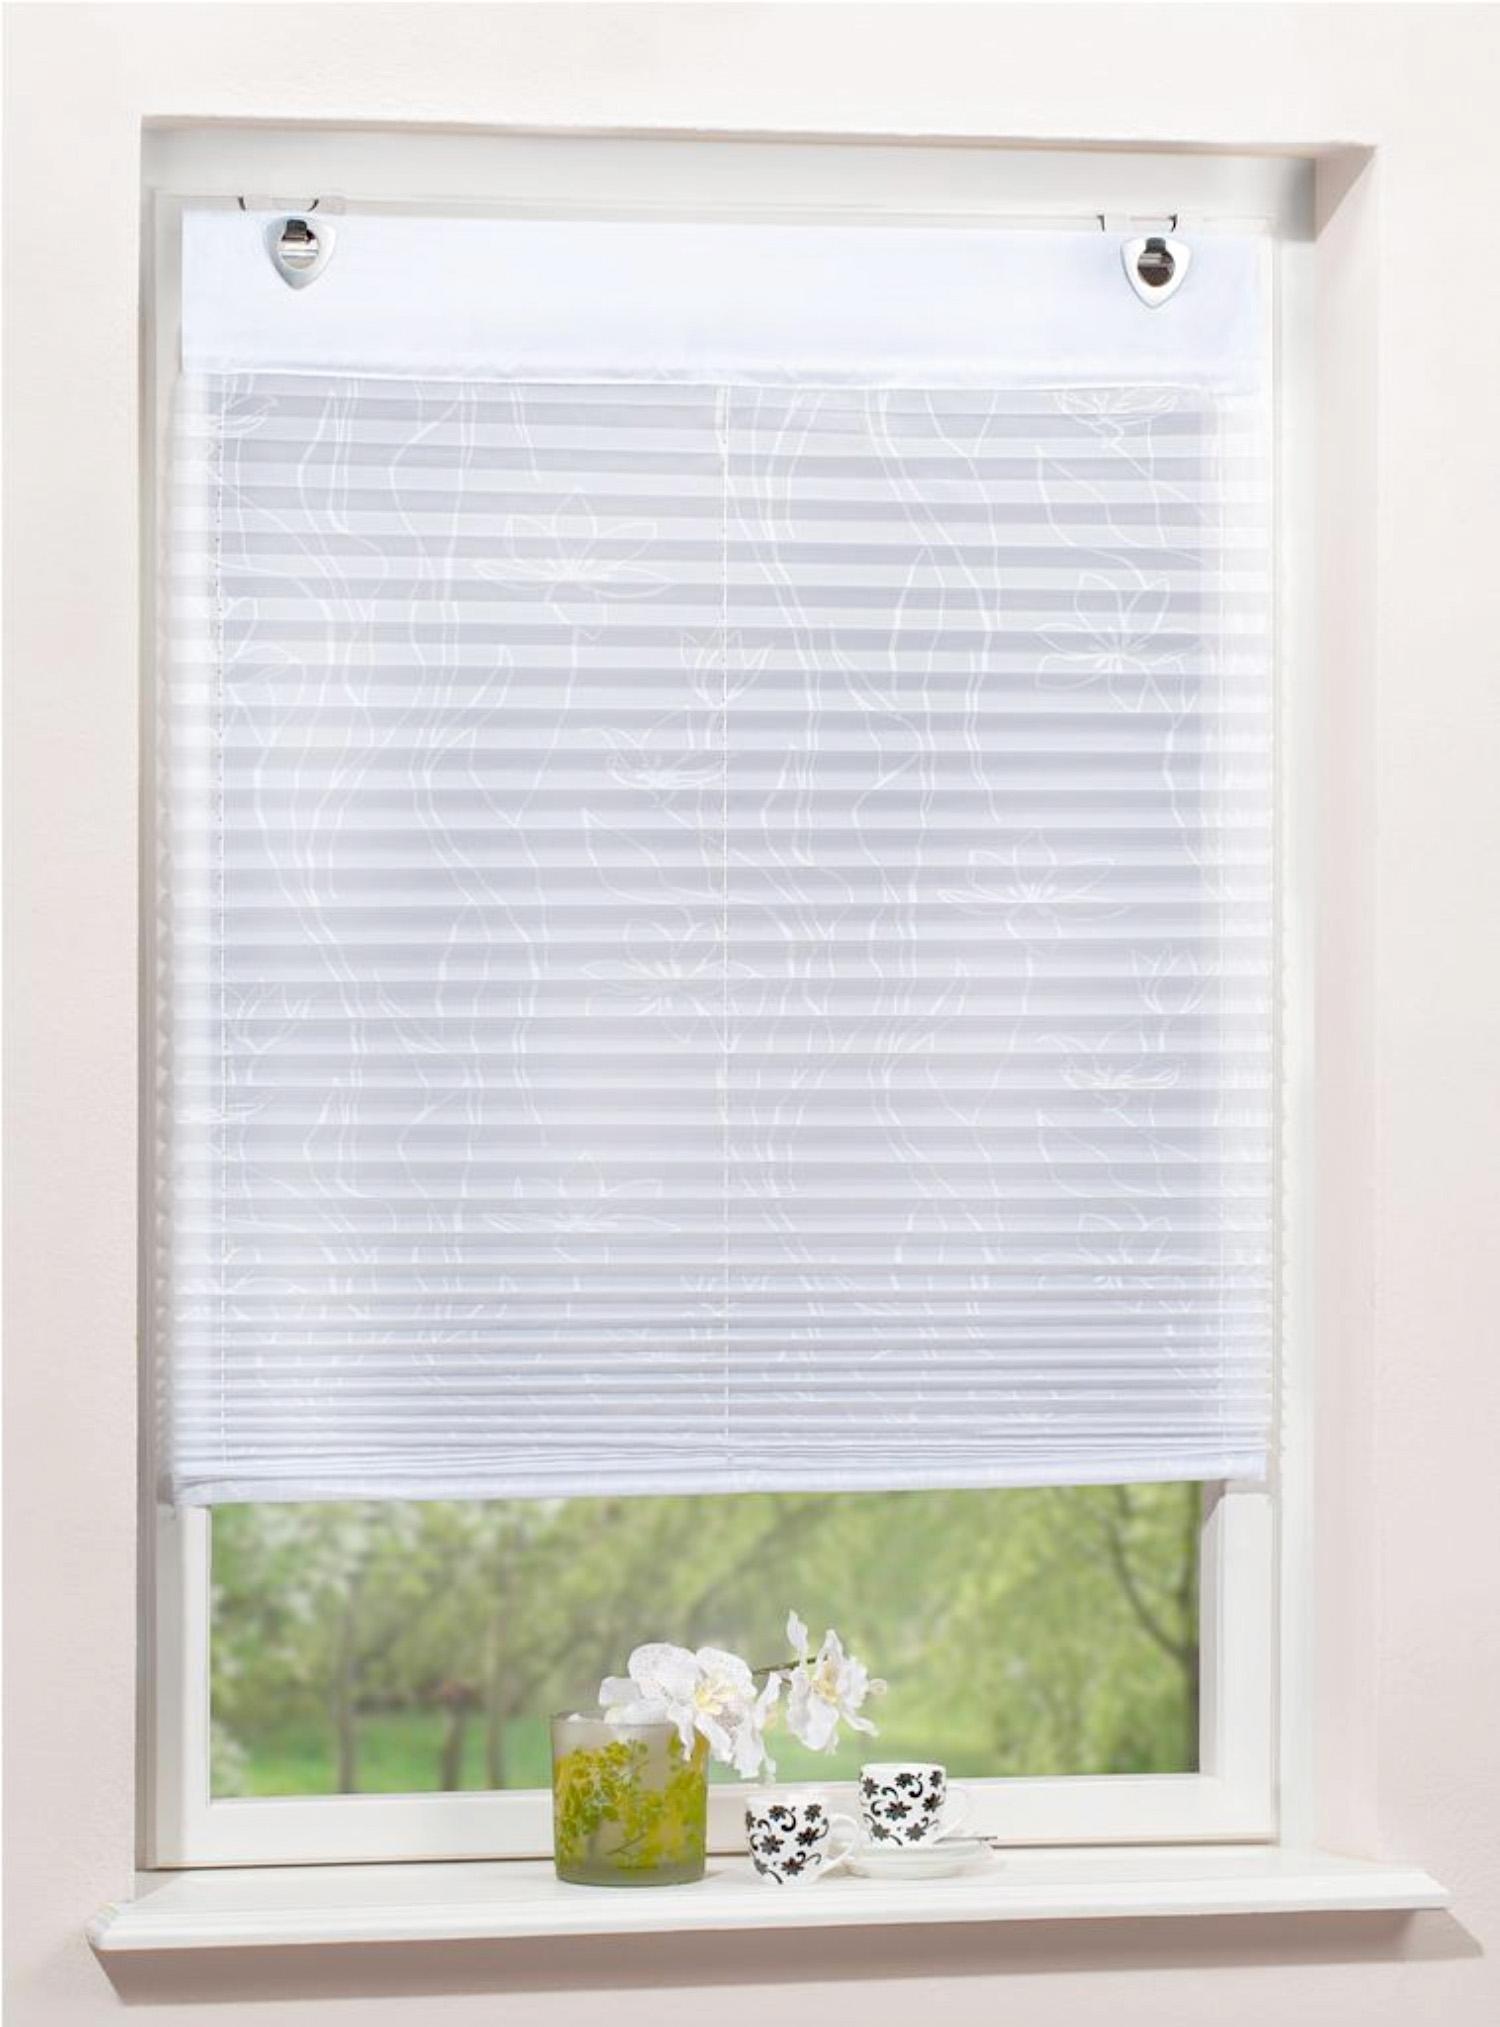 finest gordijnen zonder boren with balkon zonwering zonder boren